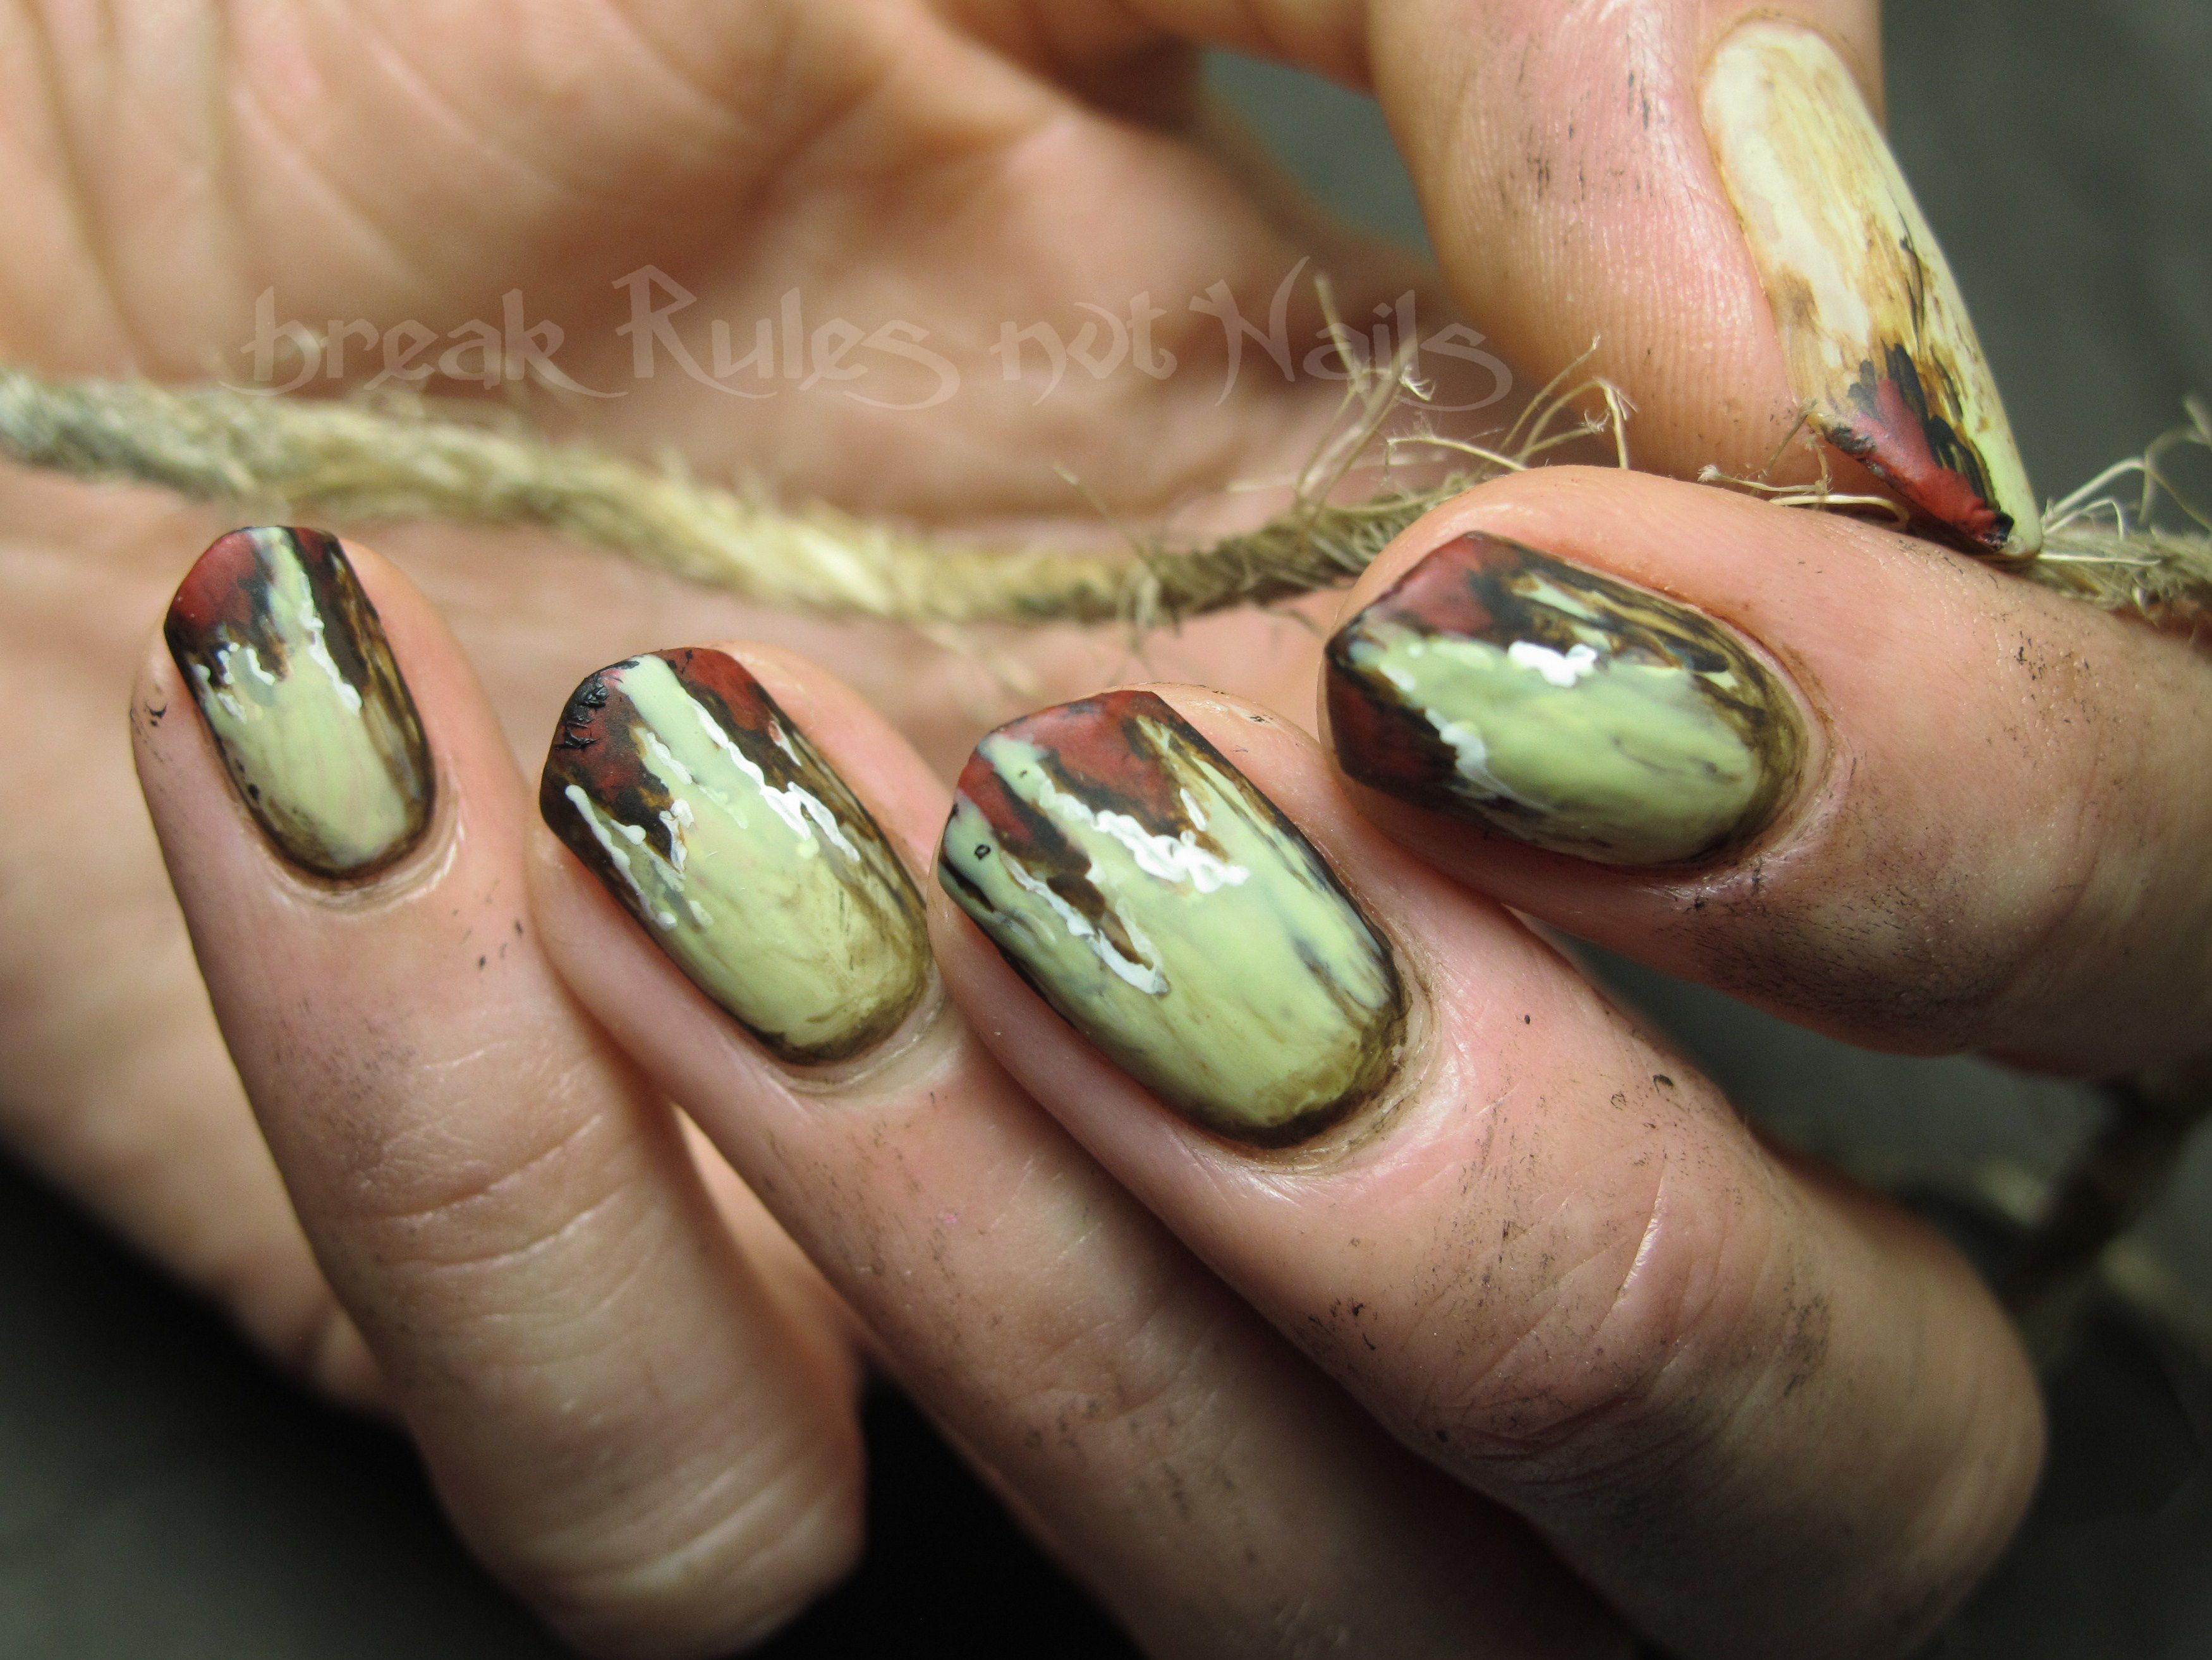 Zombie nail art break rules not nails robin zombie 3 prinsesfo Choice Image